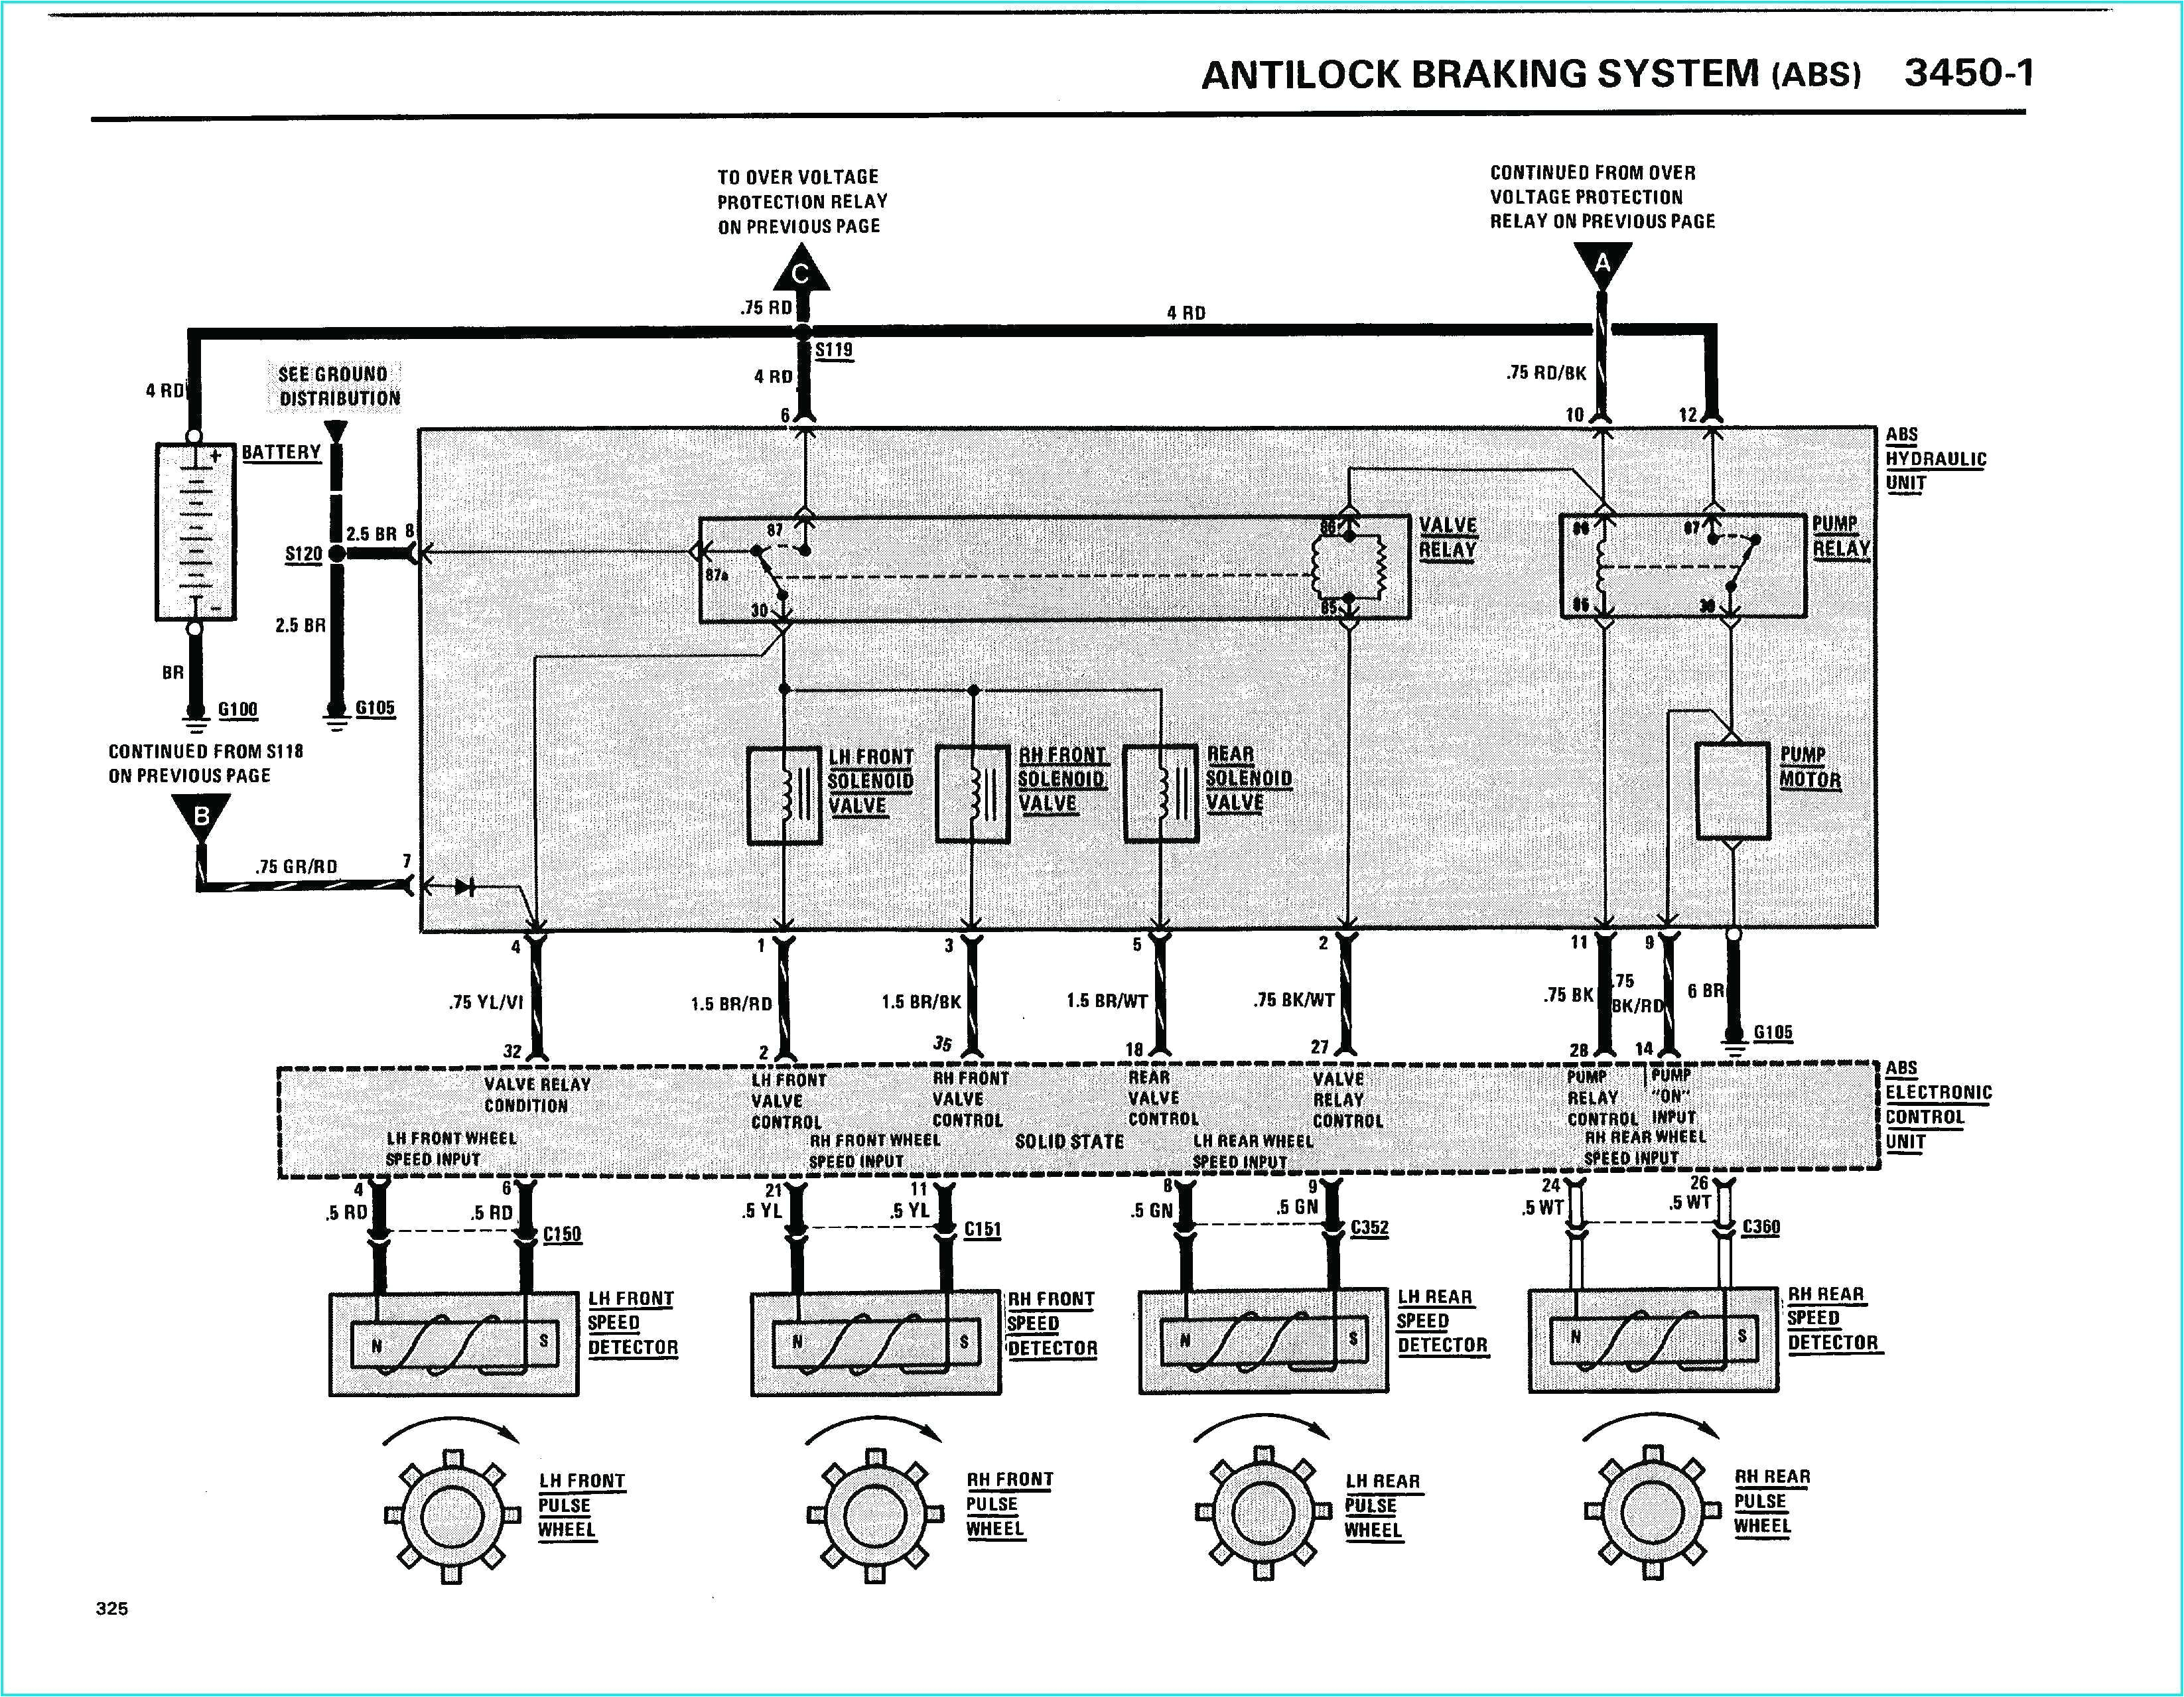 Bosch 5.3 Abs Module Wiring Diagram Abs Repair Diagrams Data Diagram Schematic